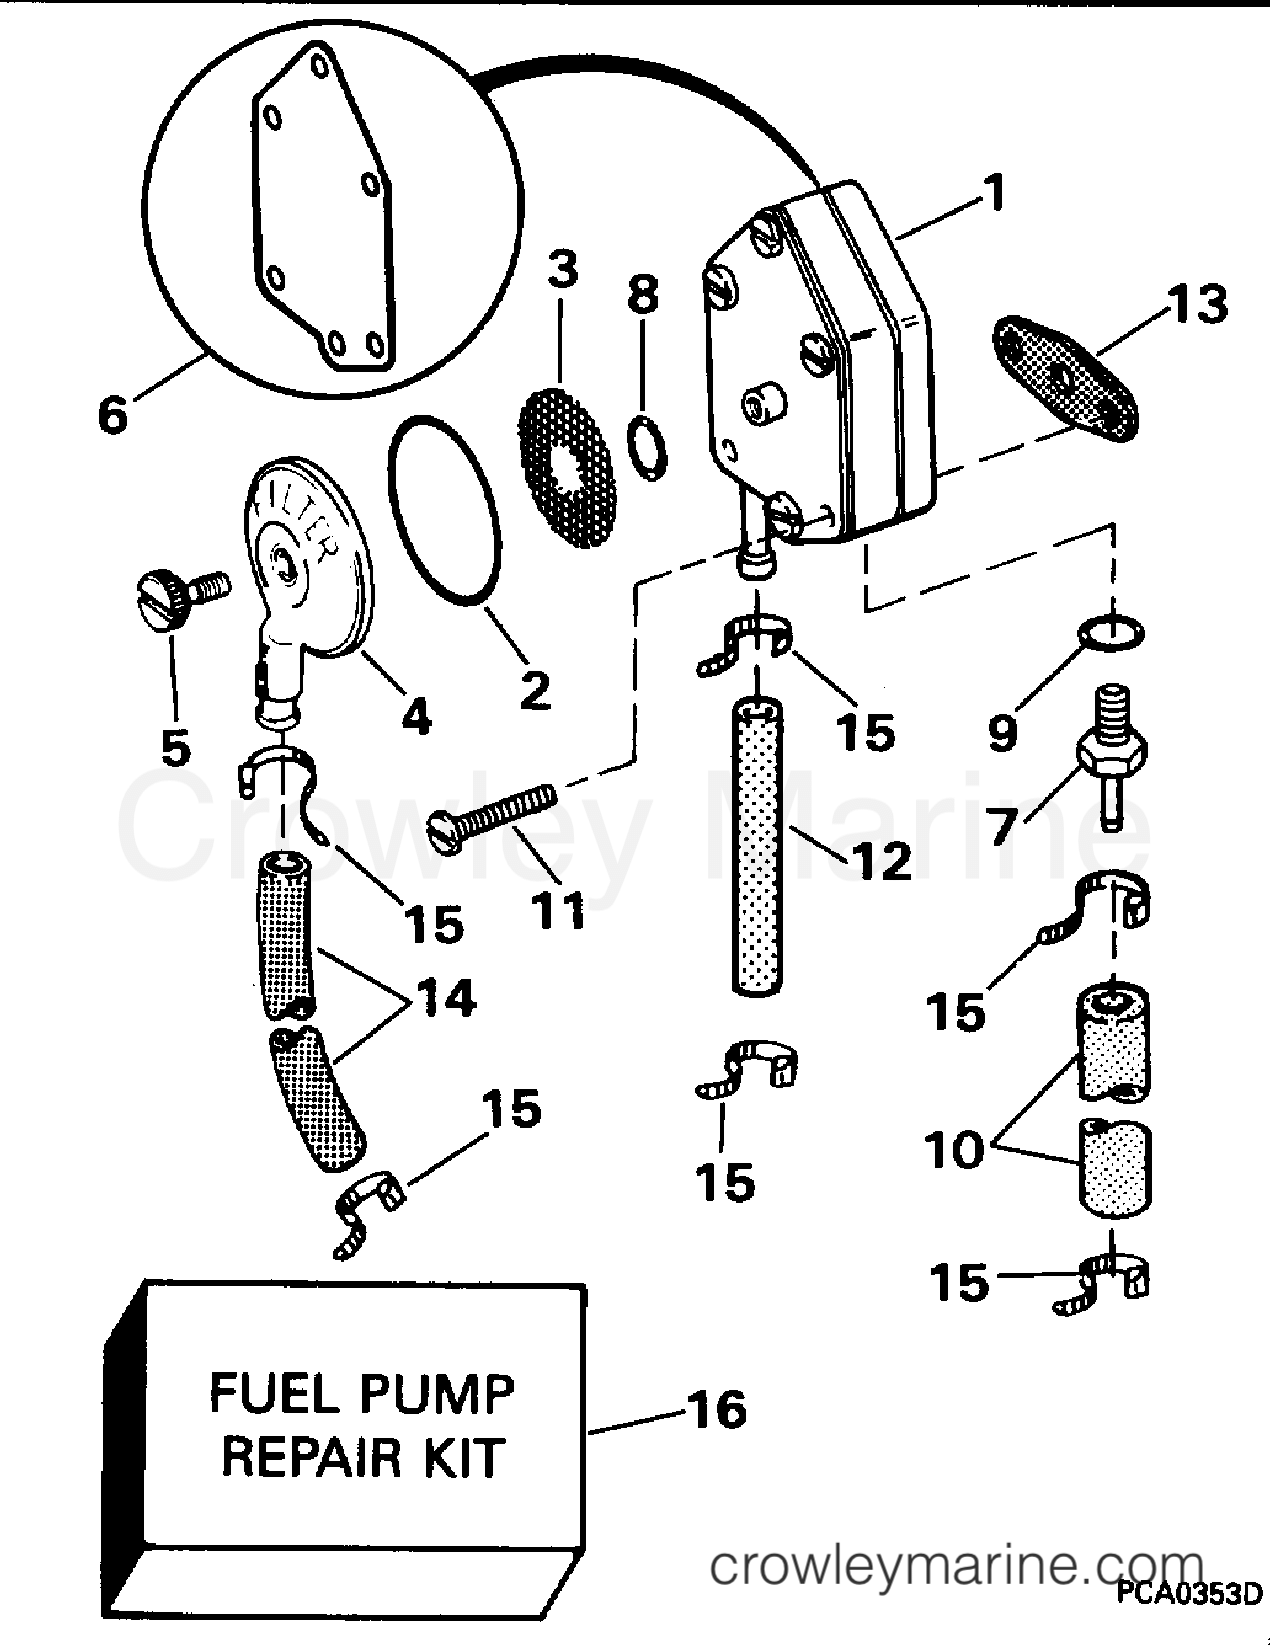 wiring diagram database  tags: #yamaha royal star venture#yamaha boat fuel  tank#yamaha fuel flow meter#yamaha fuel gauge#yamaha ignition switch#yamaha  fuel